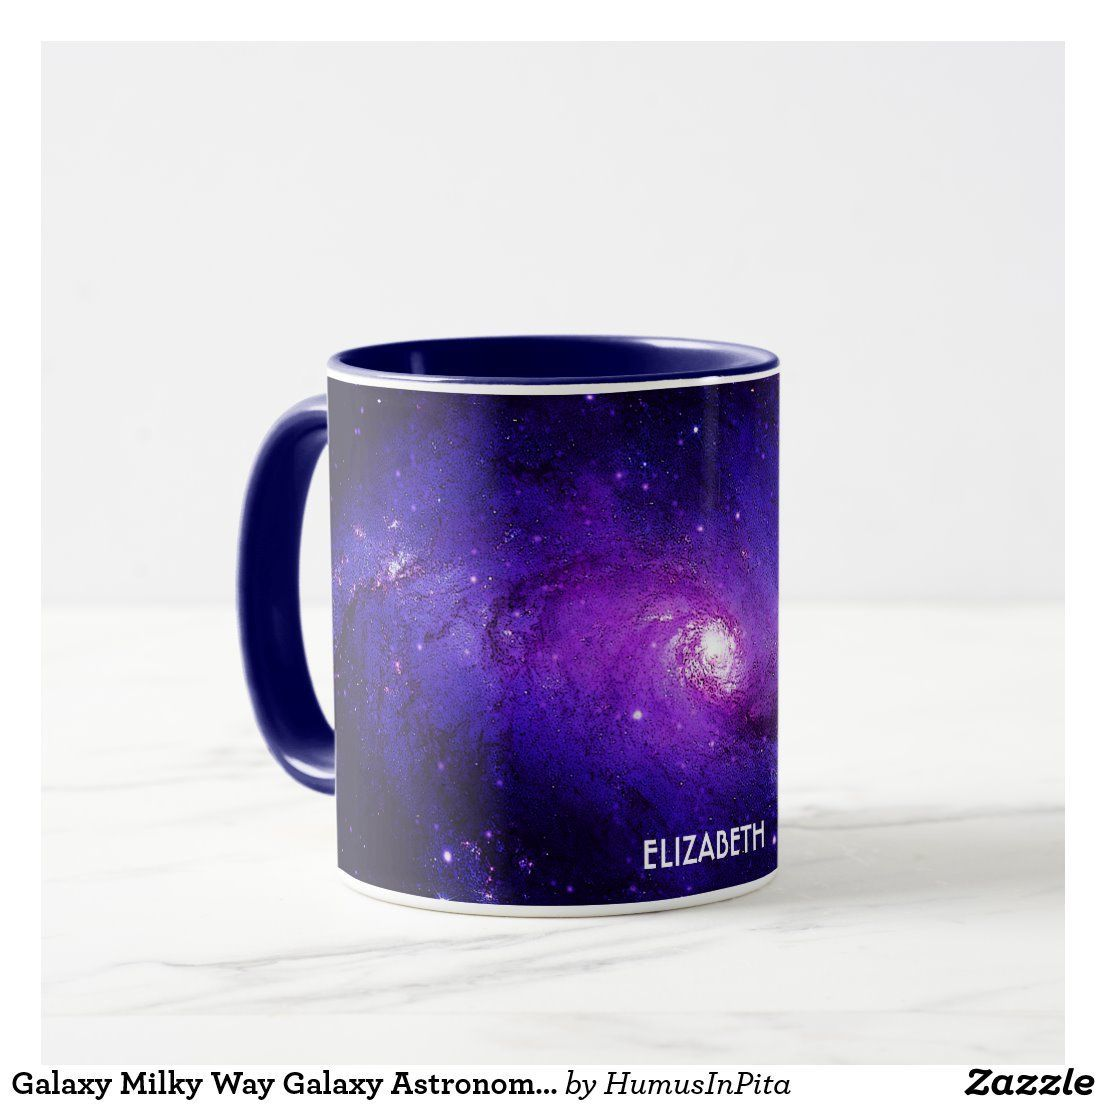 Galaxy Milky Way Galaxy Astronomy Science Mug | Zazzle.com Galaxy Milky Way Galaxy Astronomy Science Mug...  #astronomy #galaxy #milky